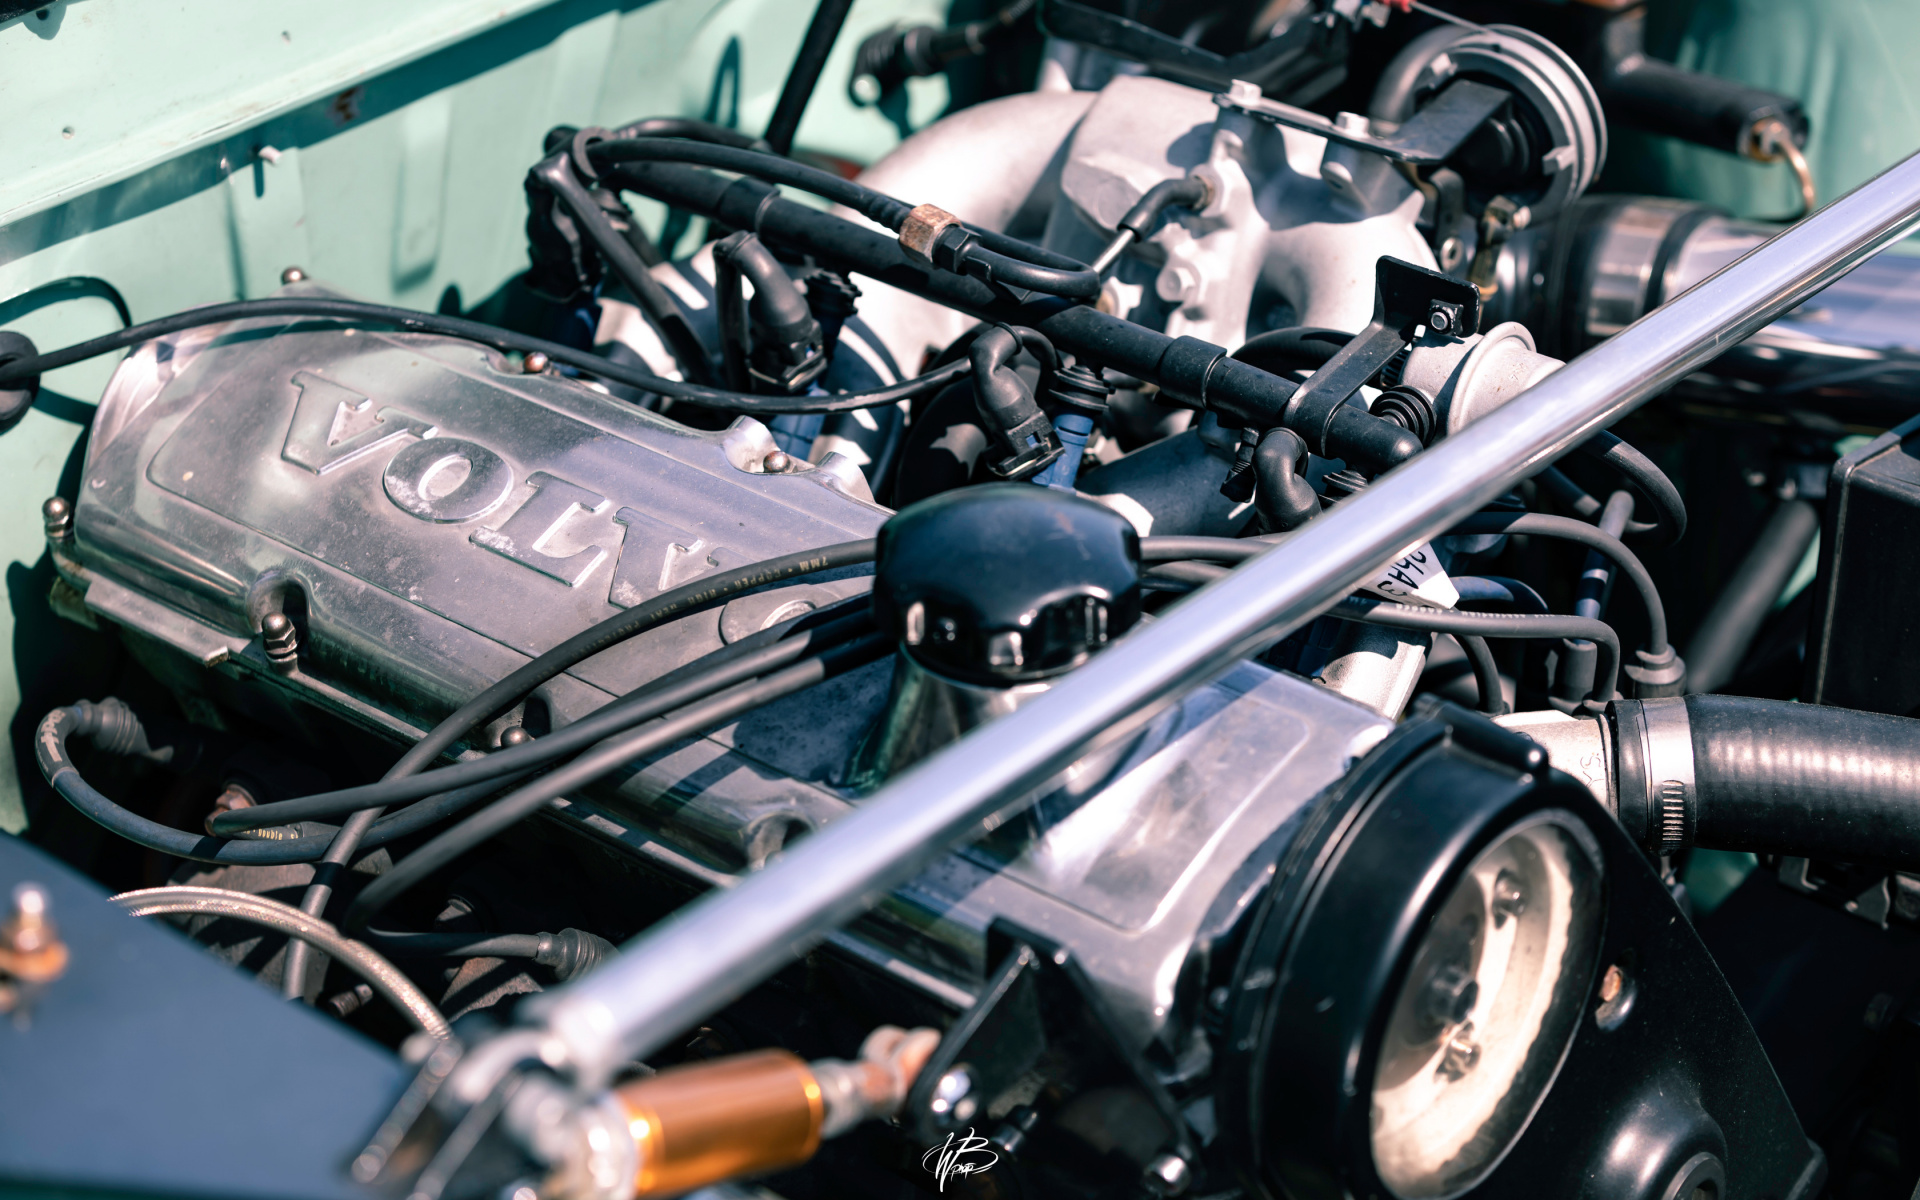 AC86EC12-69AF-4CC5-8E3B-6483E2E33904.jpeg